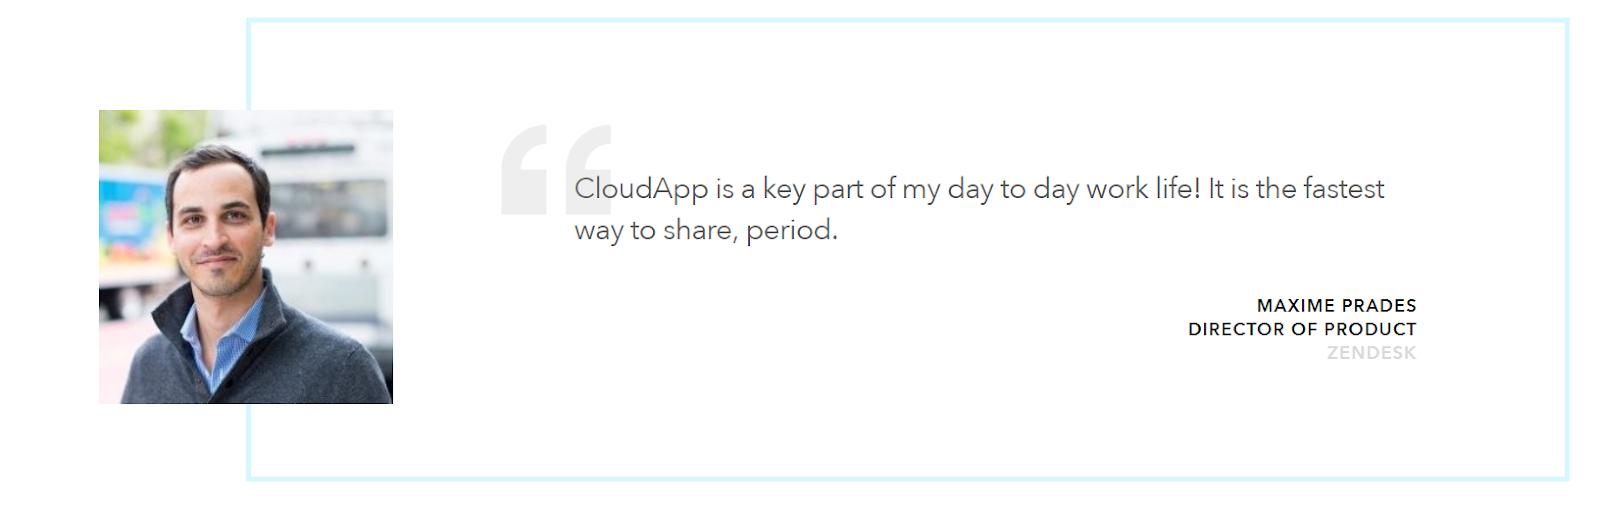 cloudapp video recording software